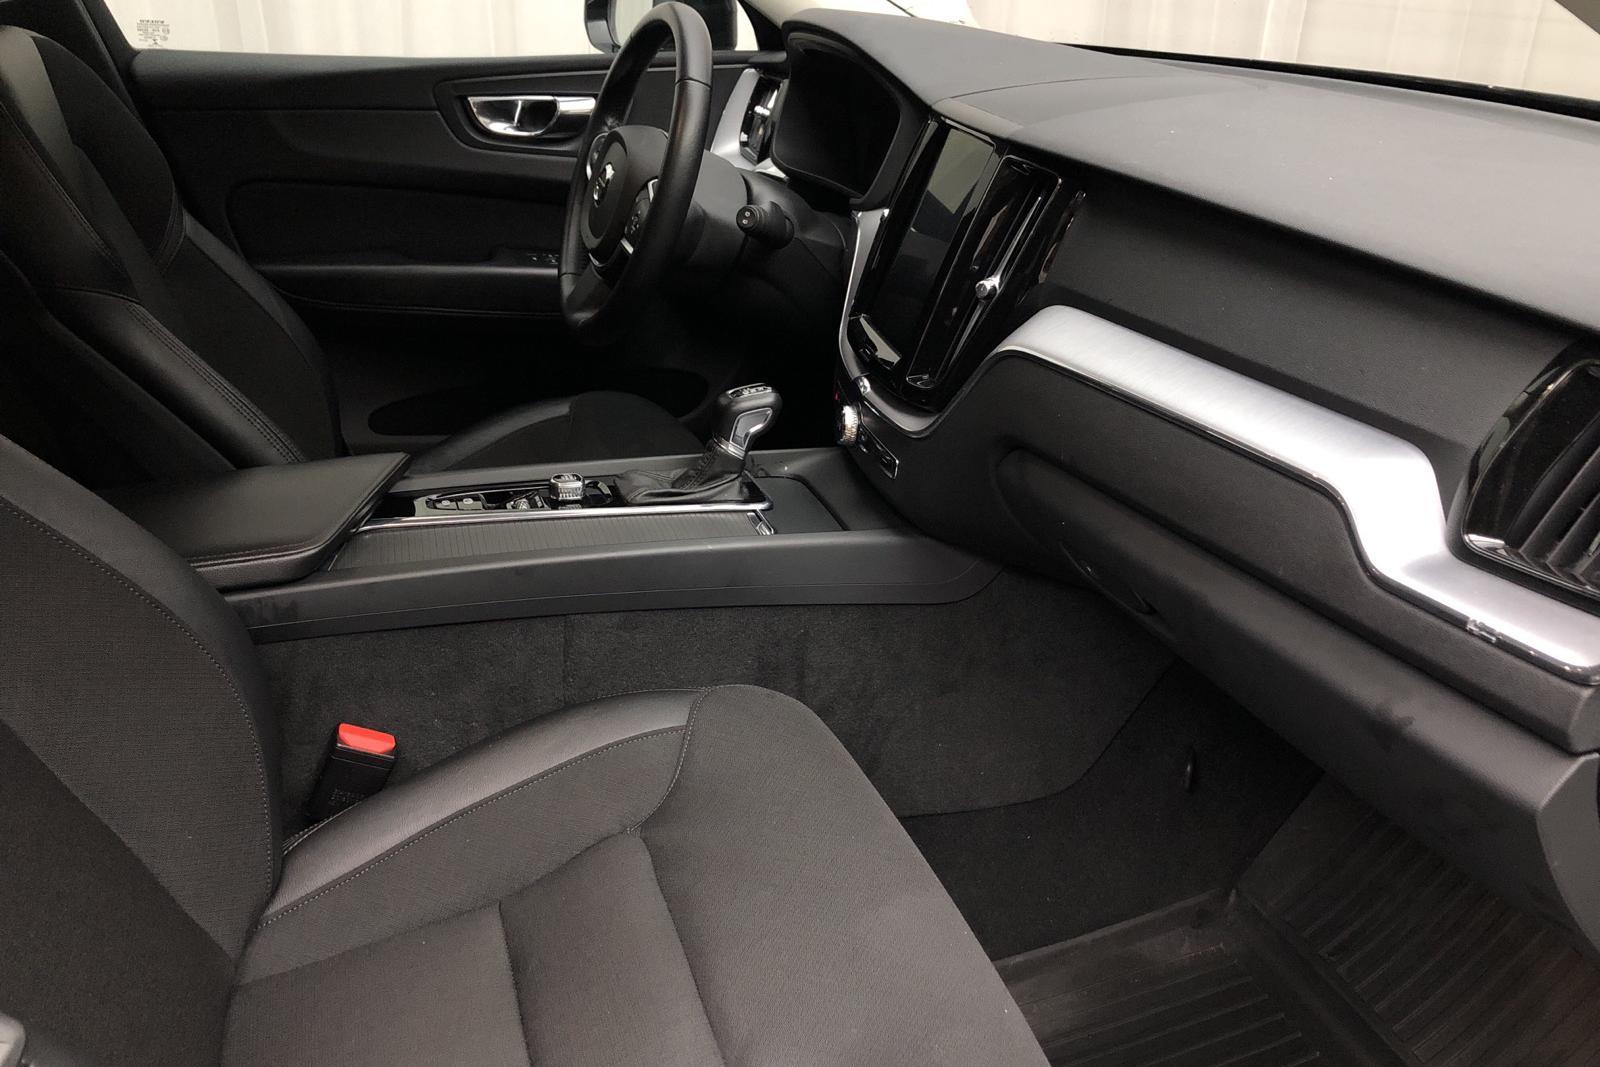 Volvo XC60 T5 2WD (254hk) - 123 580 km - Automatic - black - 2018